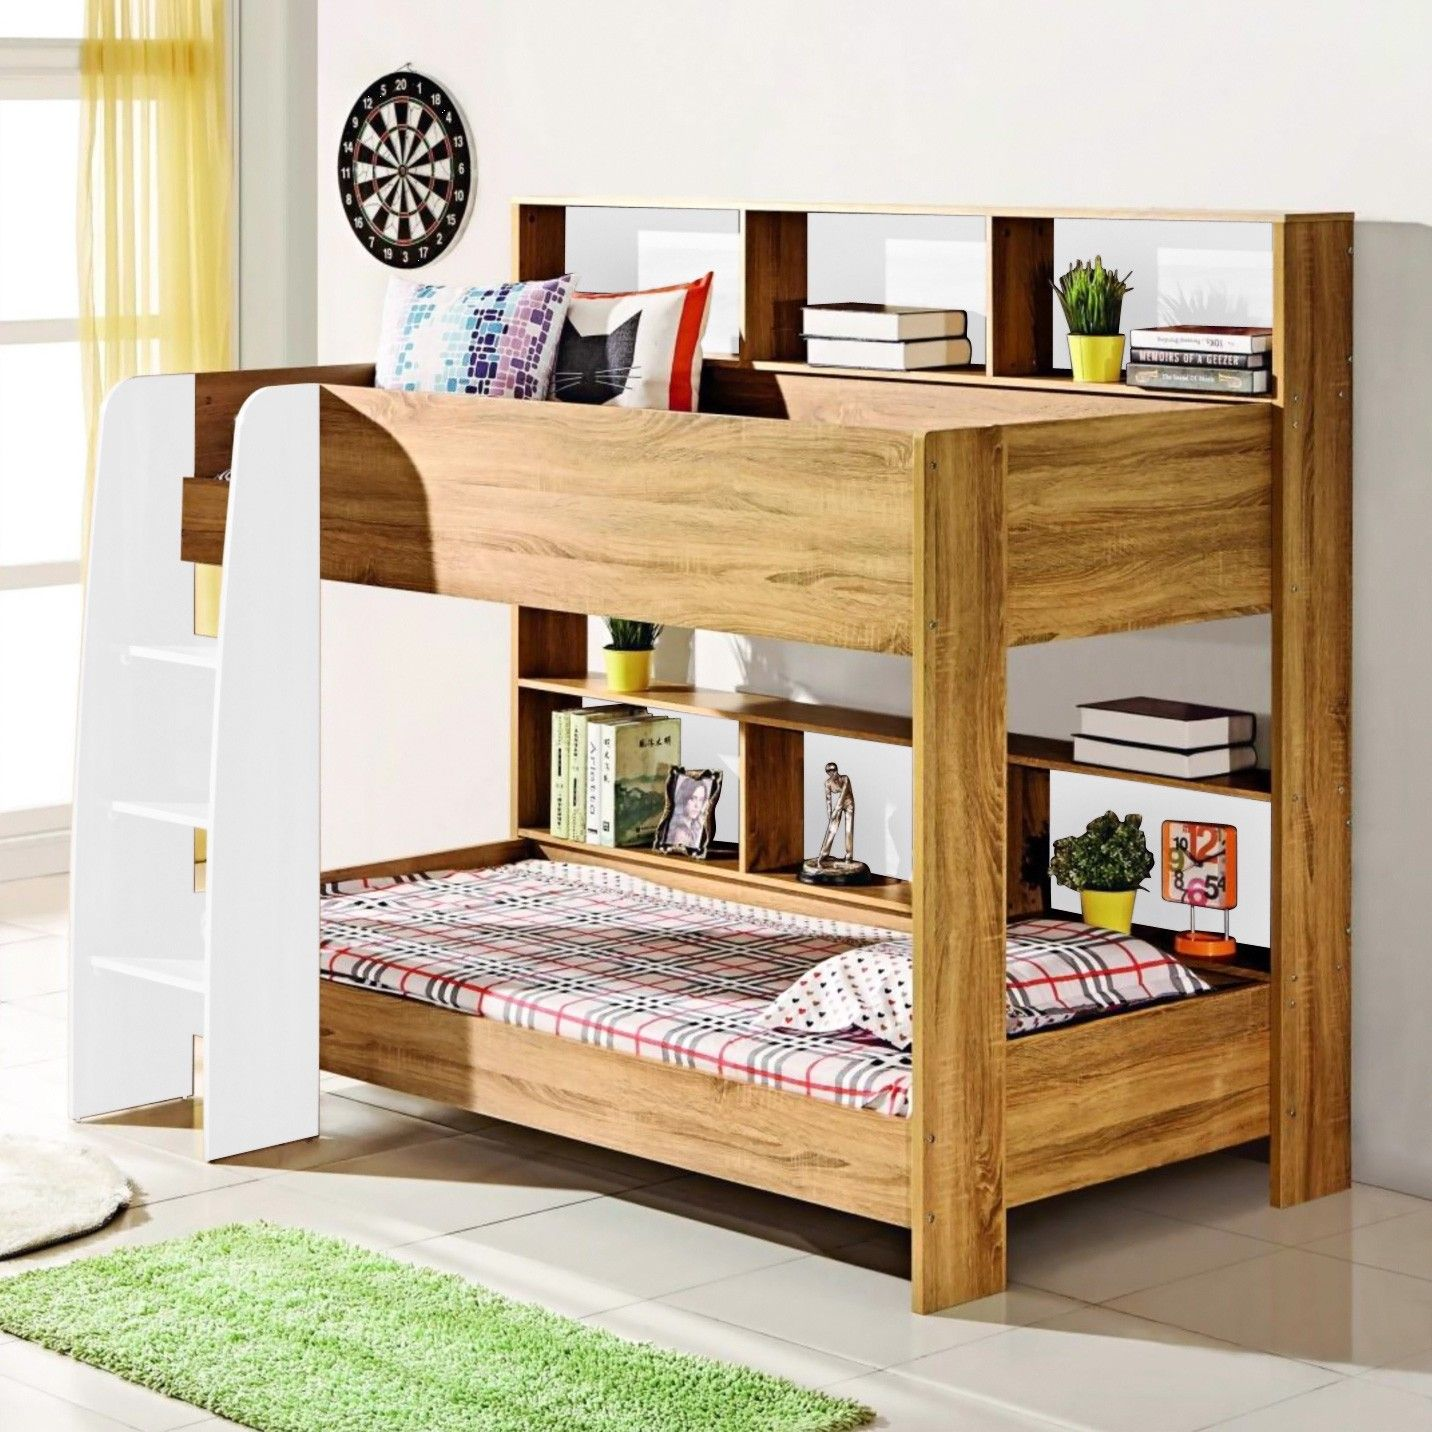 Peterstow Bunk Bed, Single, Natural Bunk beds, Single